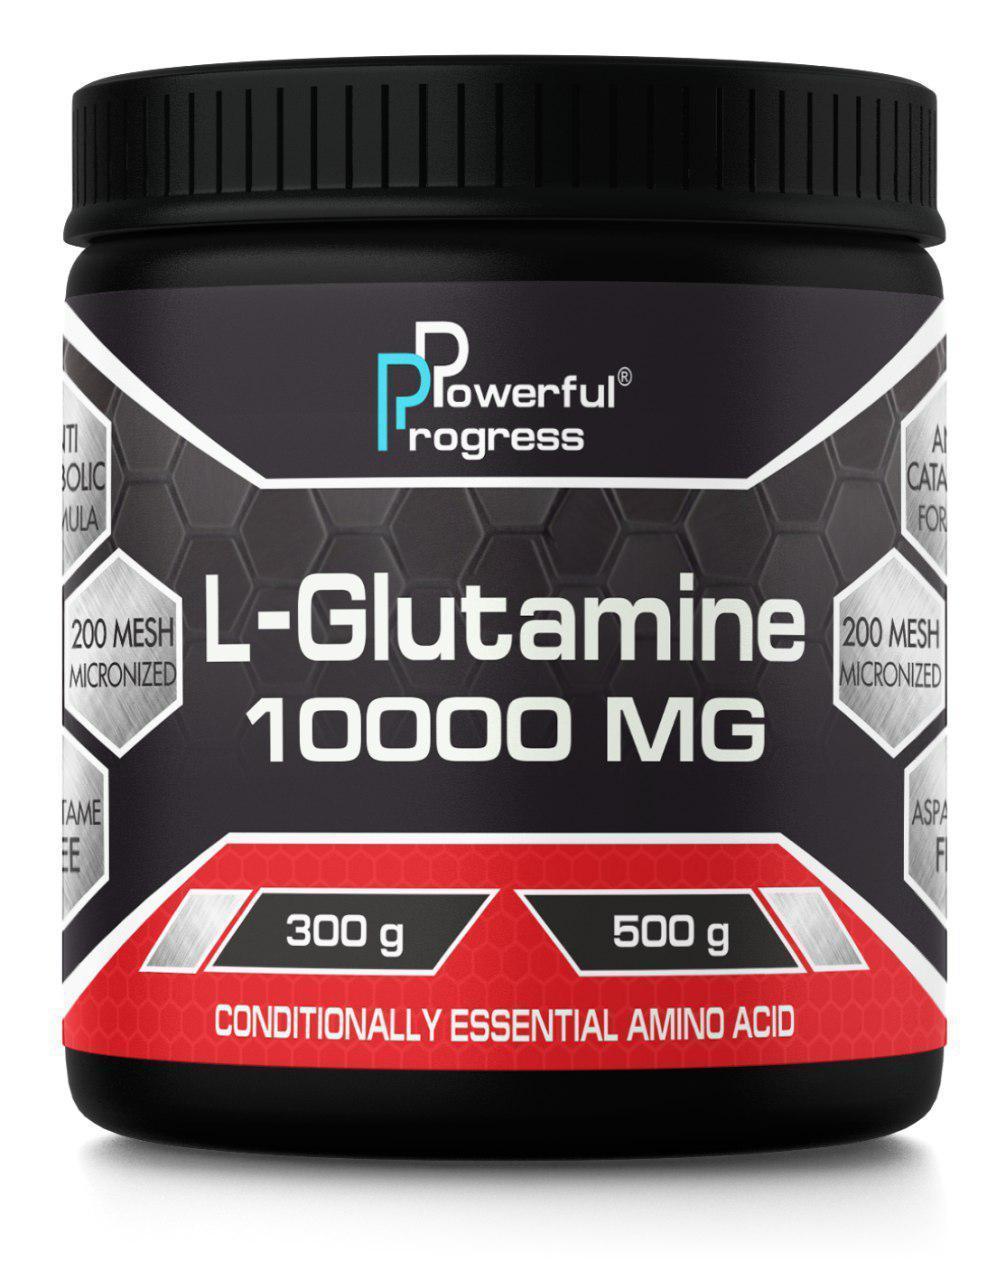 Глутамин Powerful Progress L-Glutamine 500g